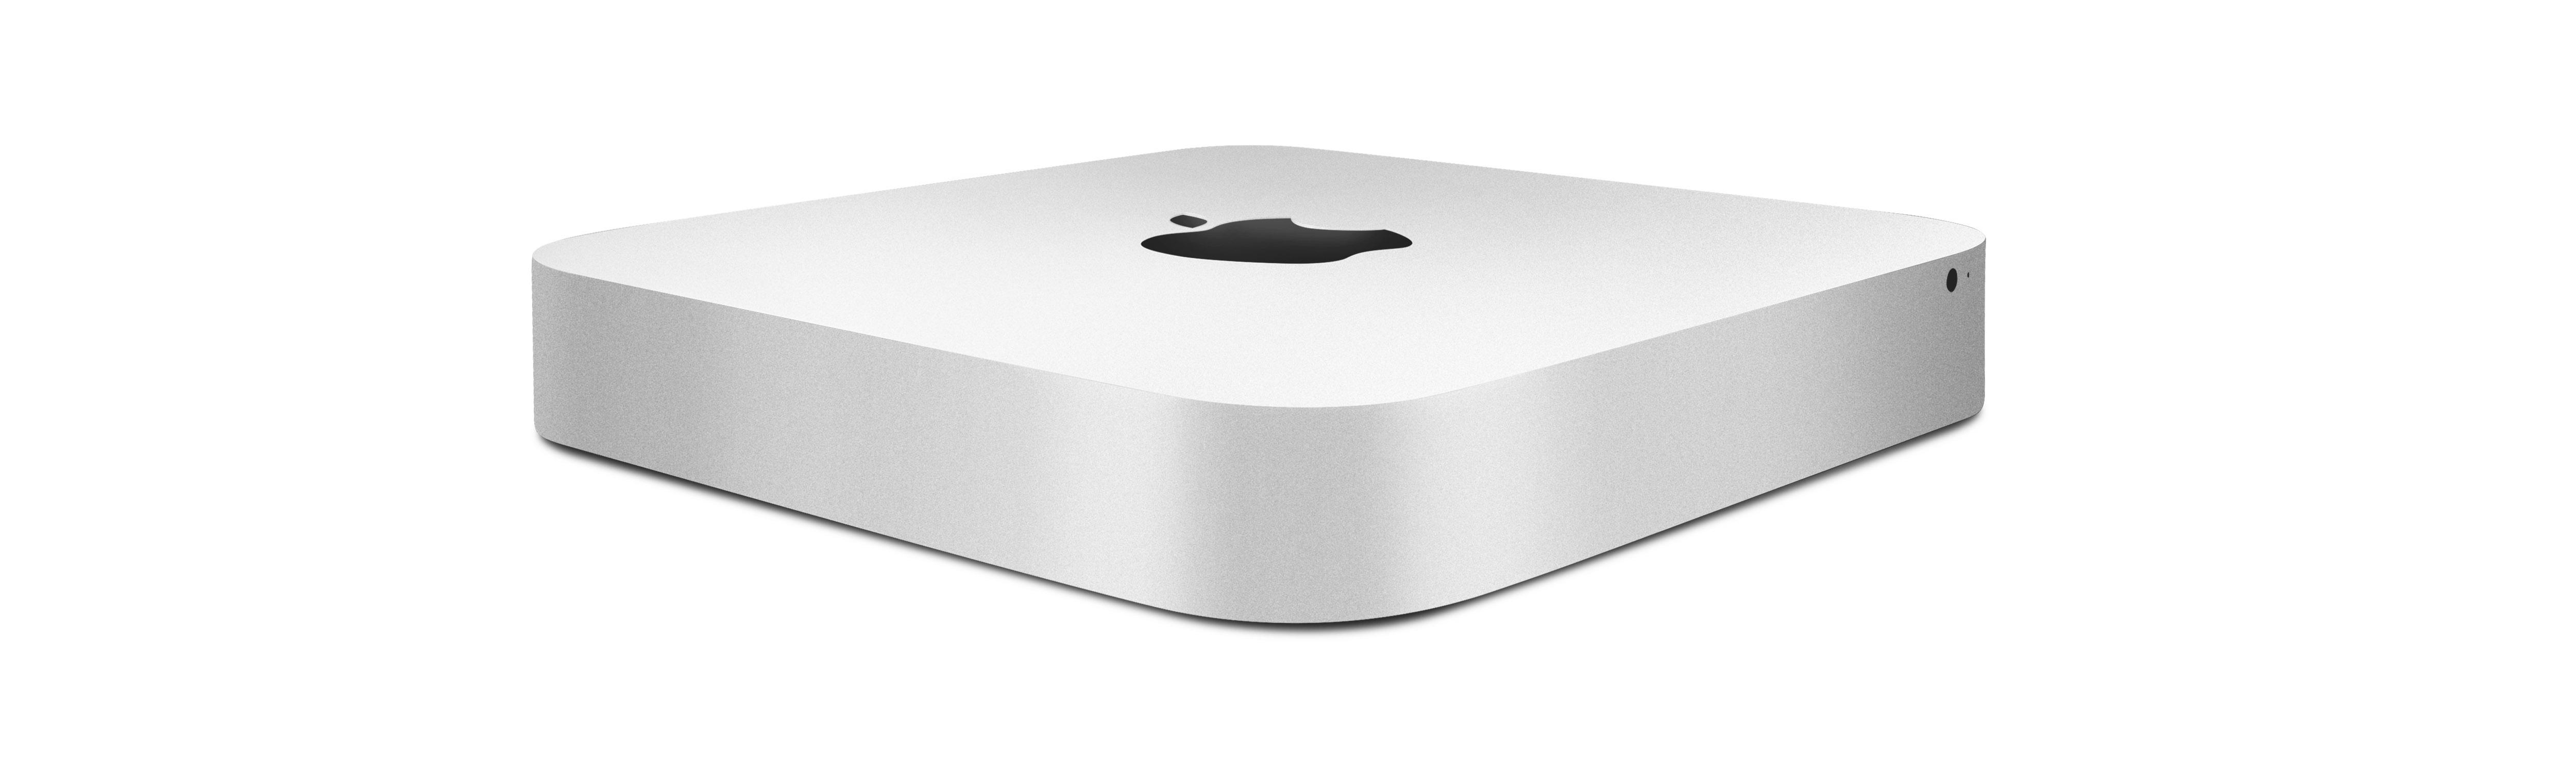 Apple Mac mini - Apple Support Hamburg